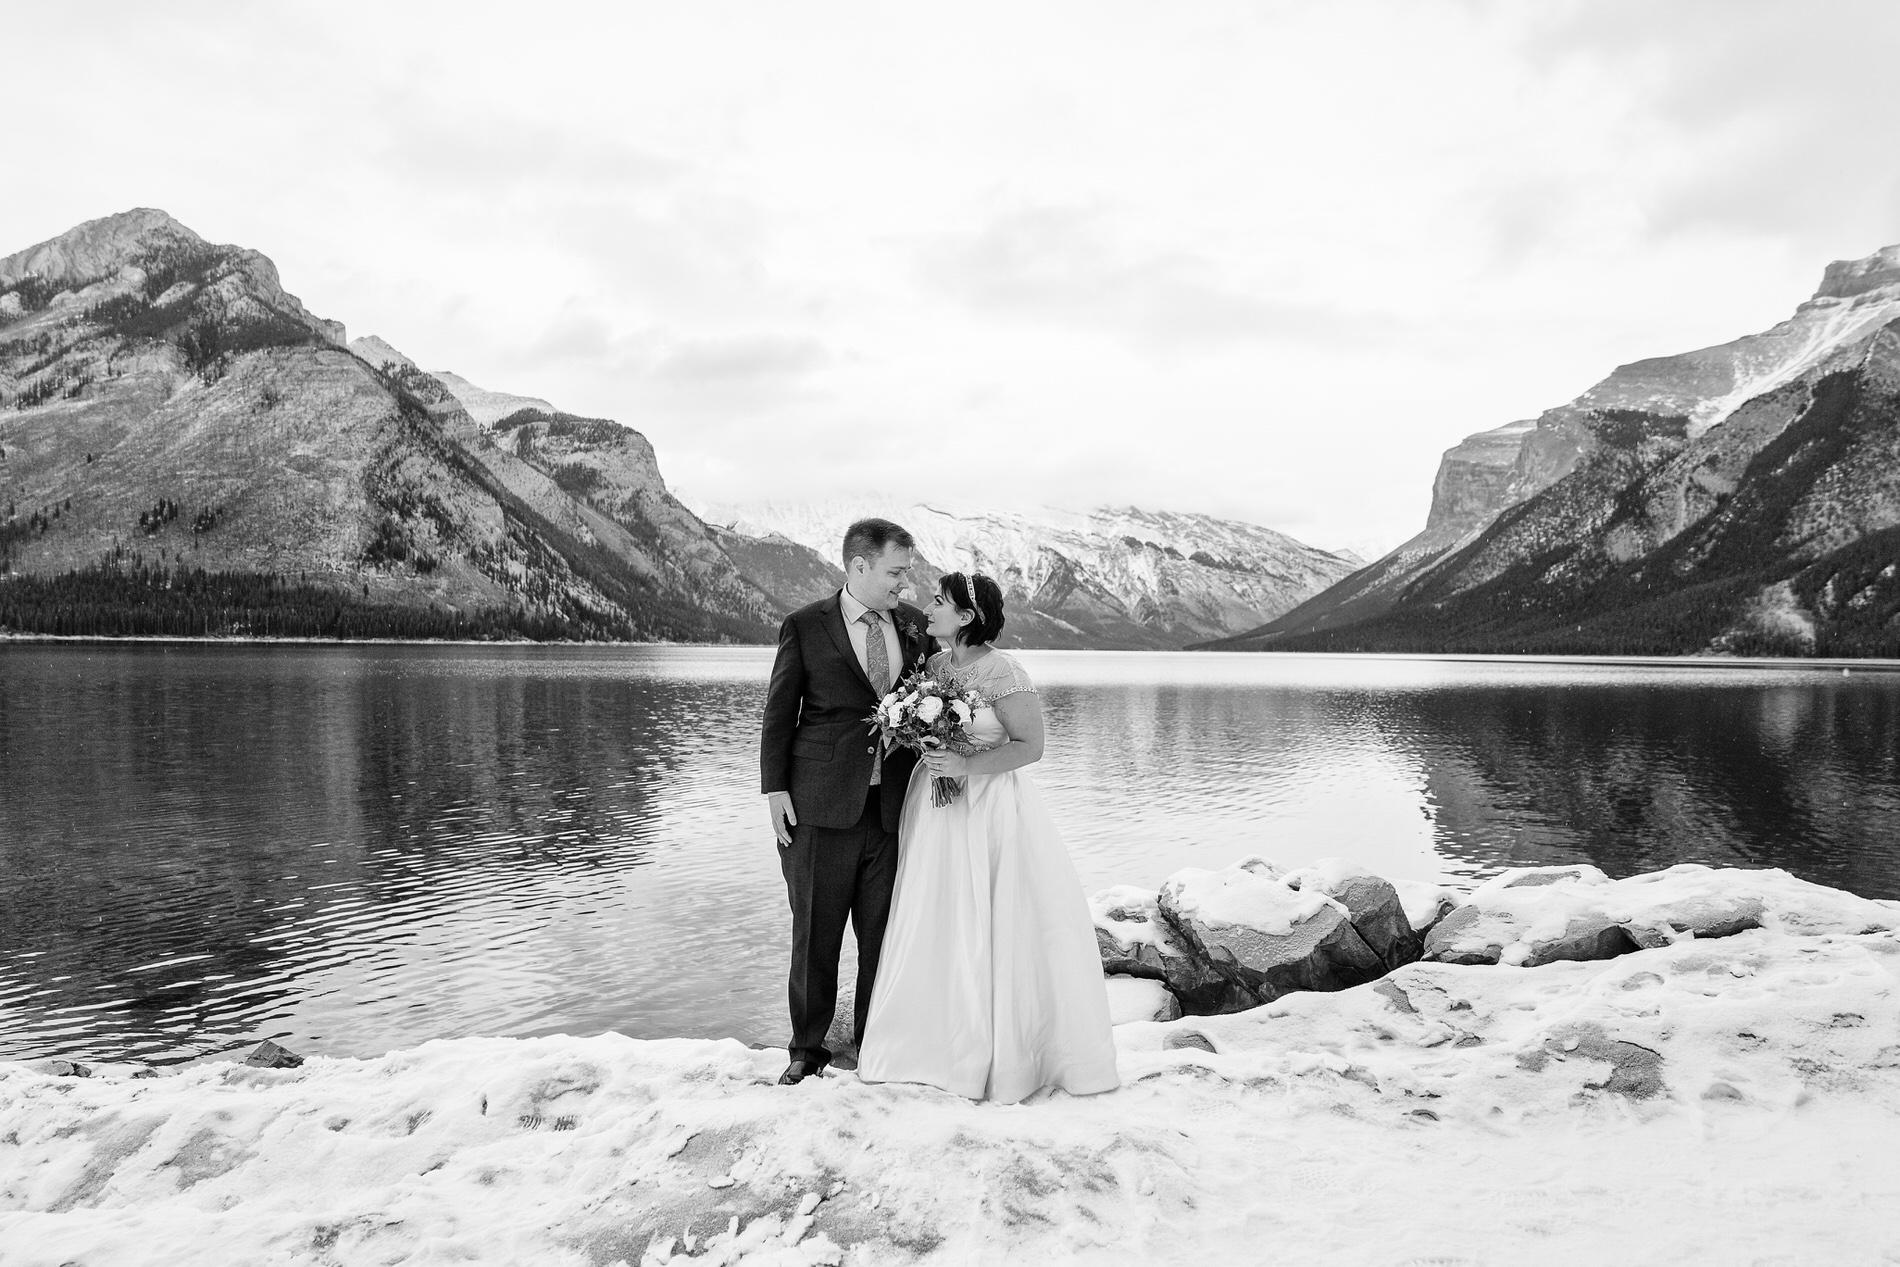 Sari and Greg Wedding-021.jpg